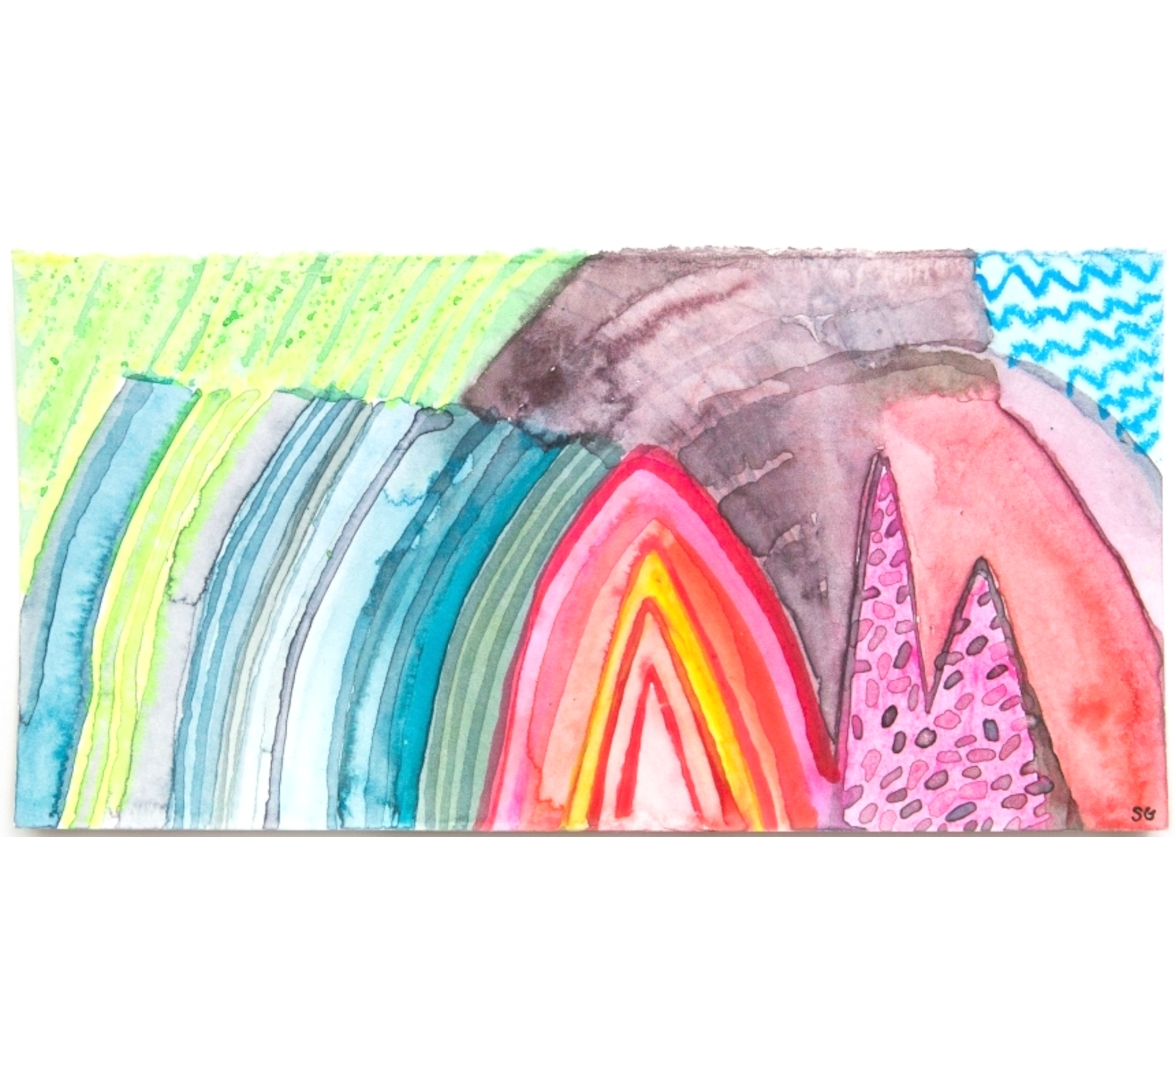 Textile Sample 8 by Sarah  Gibeault